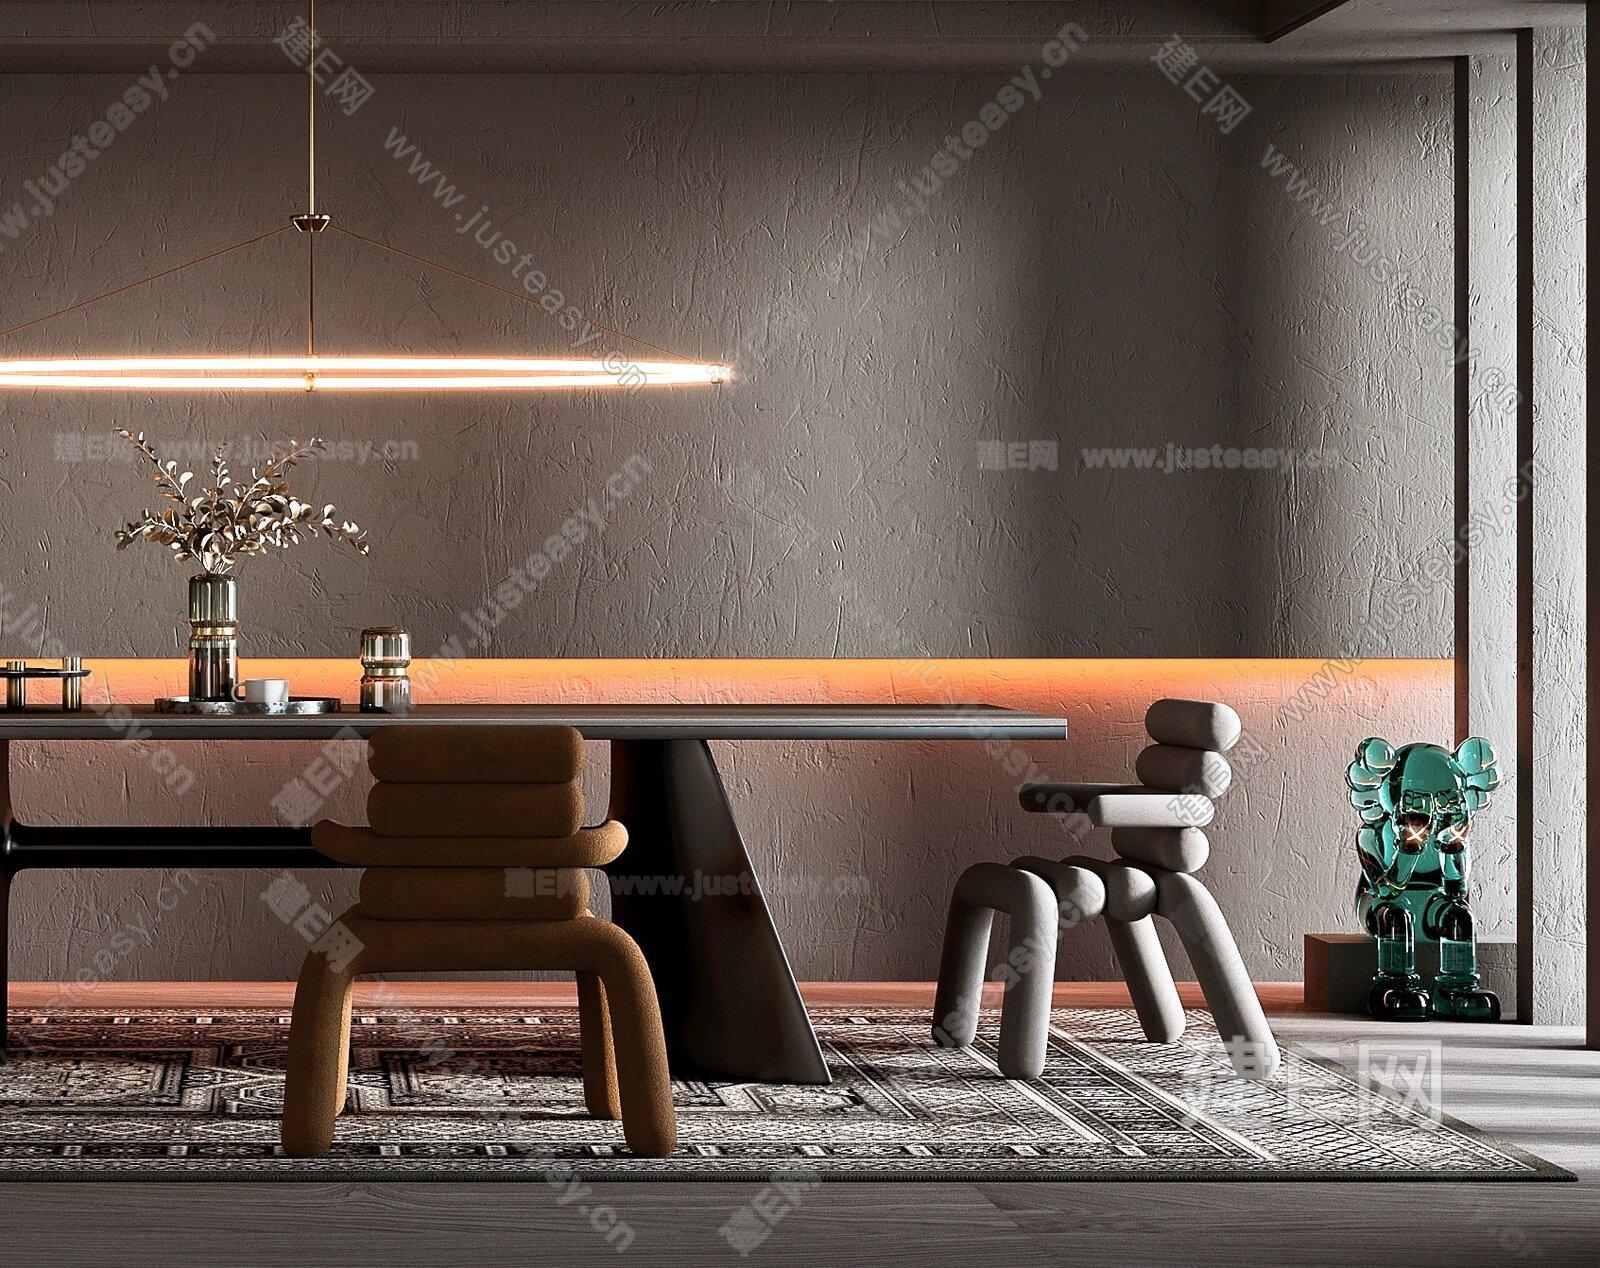 Serge Somkin 现代侘寂风餐厅 3d模型